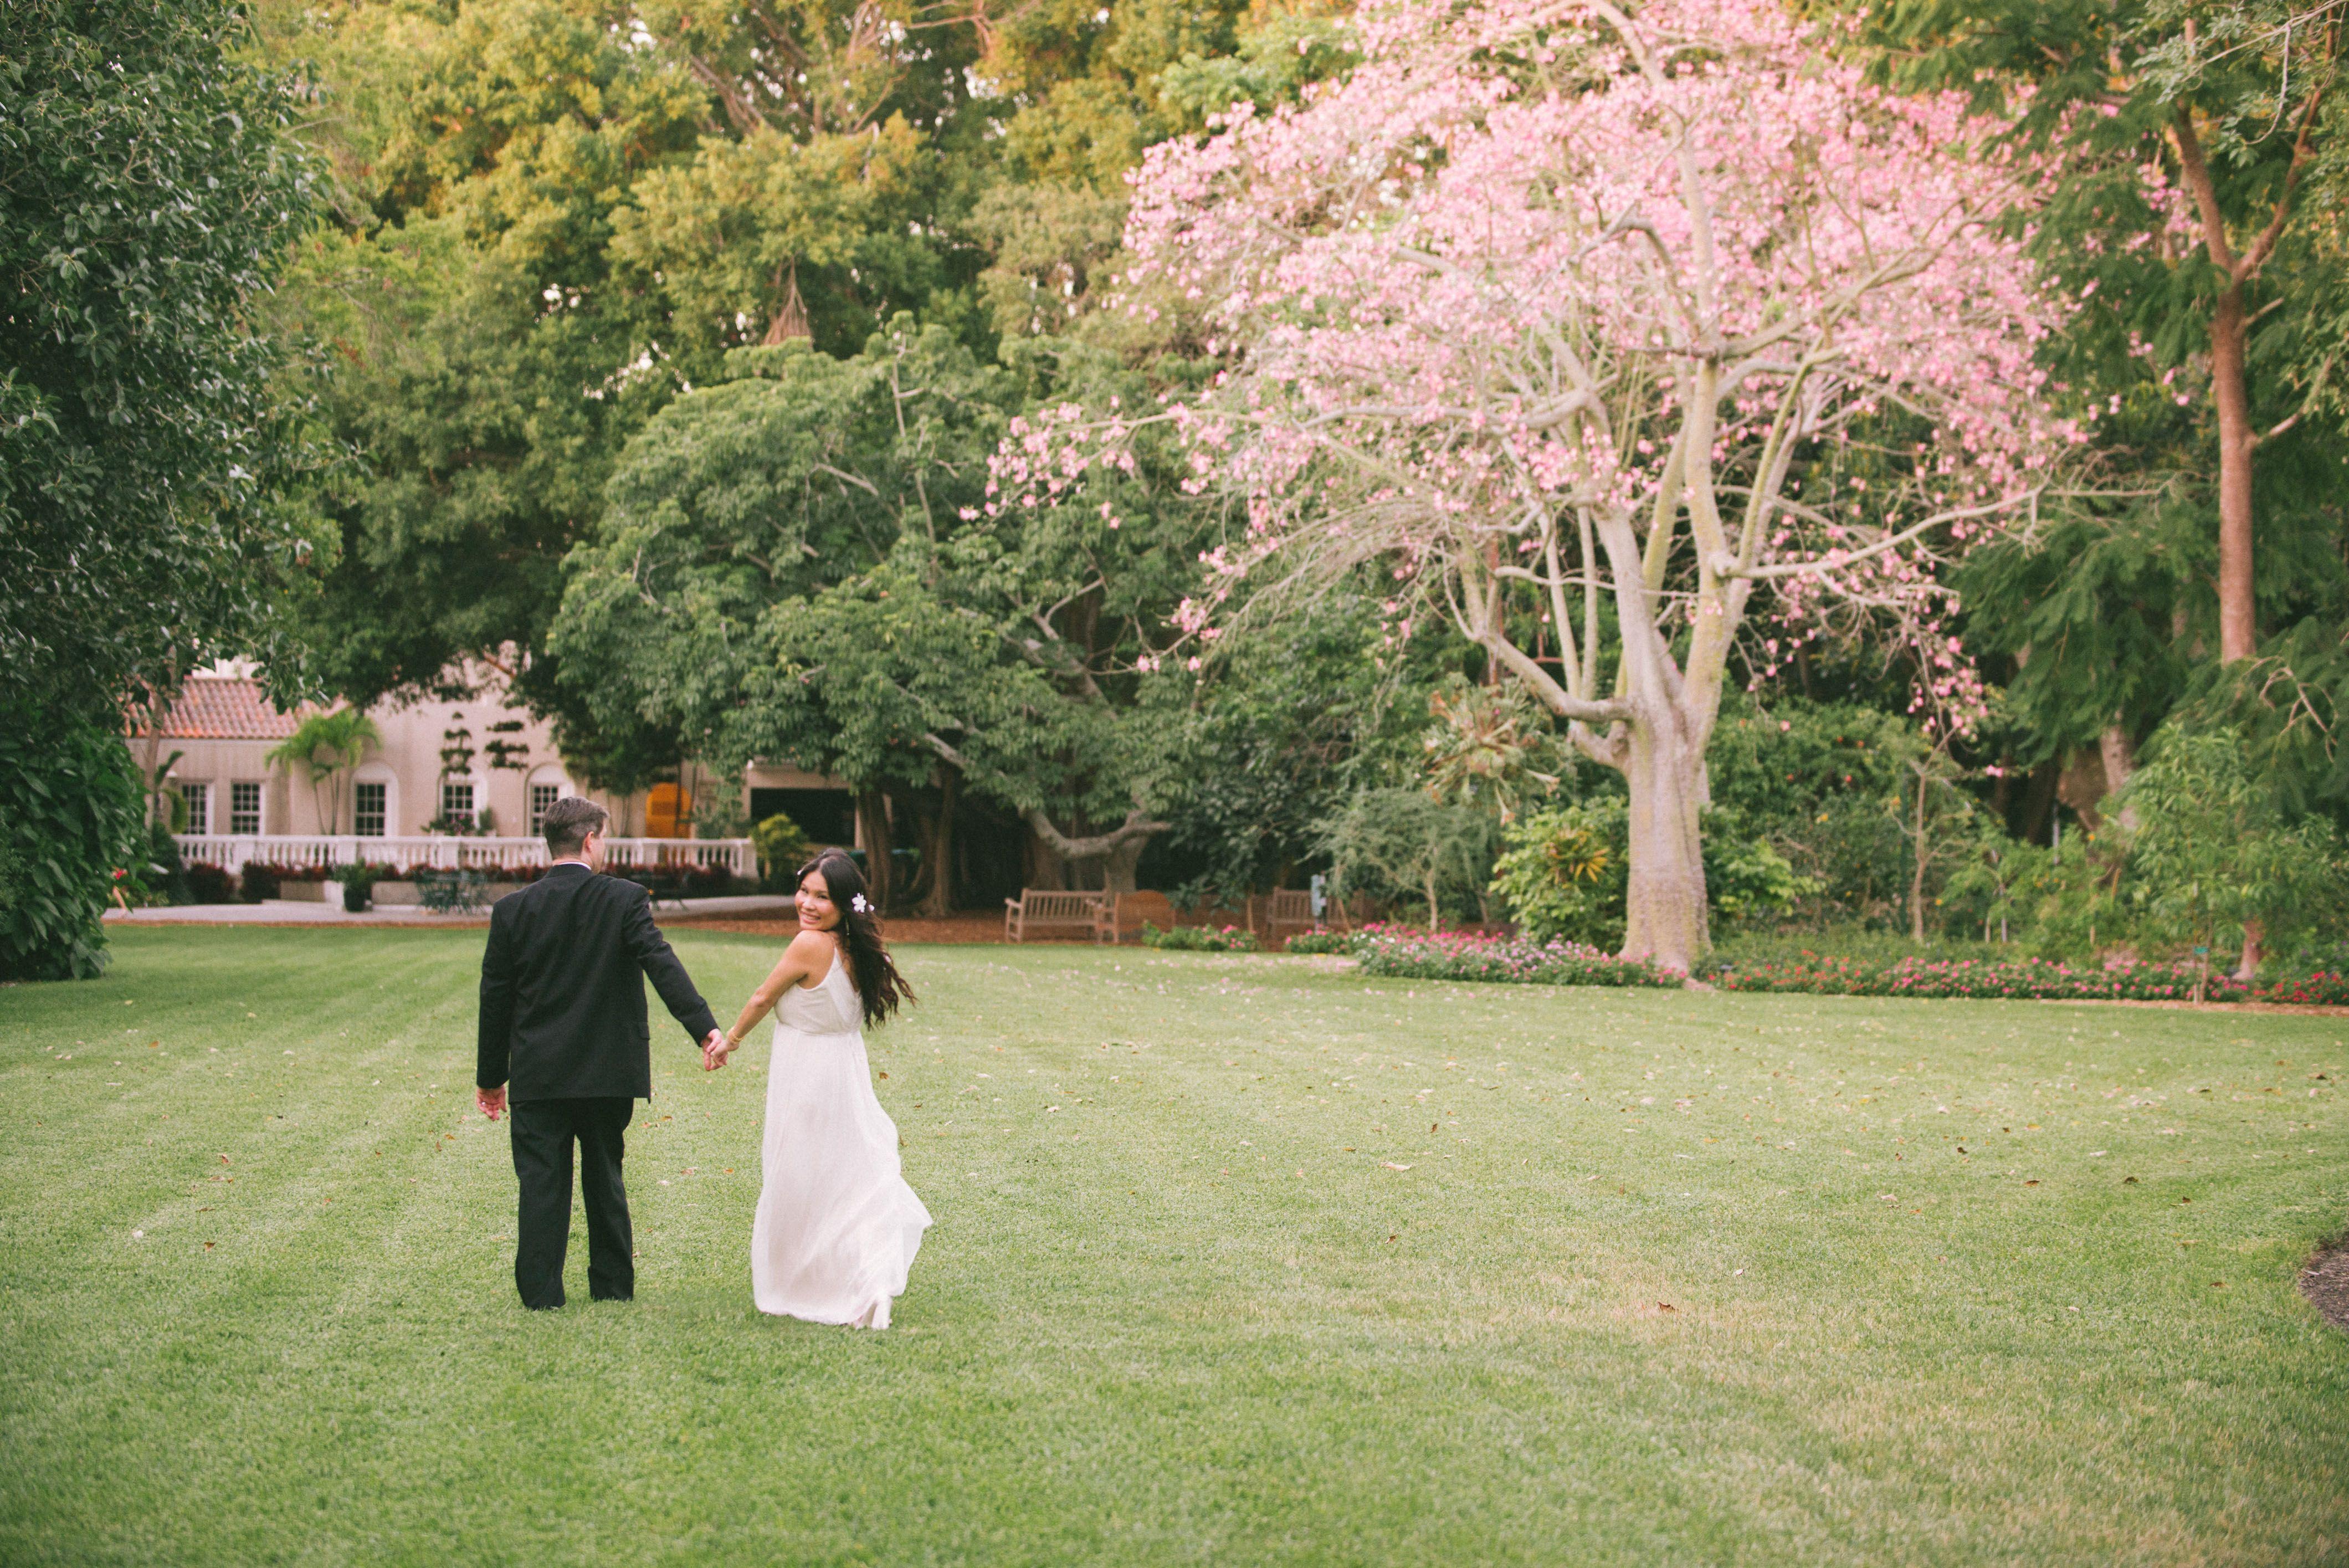 Saja wedding dresses style hb sajawedding backyard saja